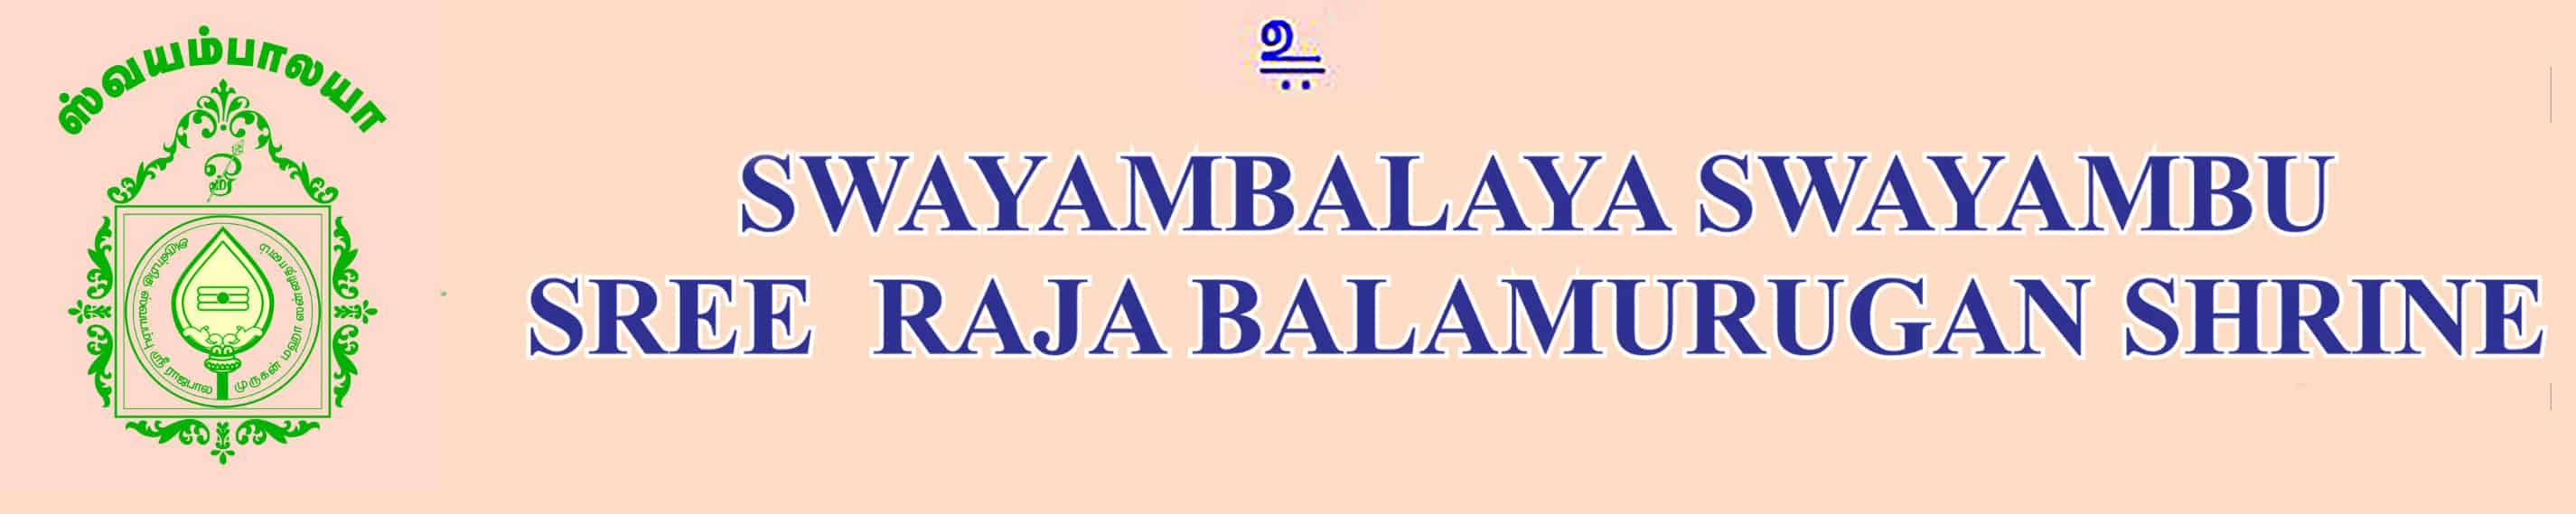 Swayambalaya Swayambu | Sree Raja Bala Murugan Shrine